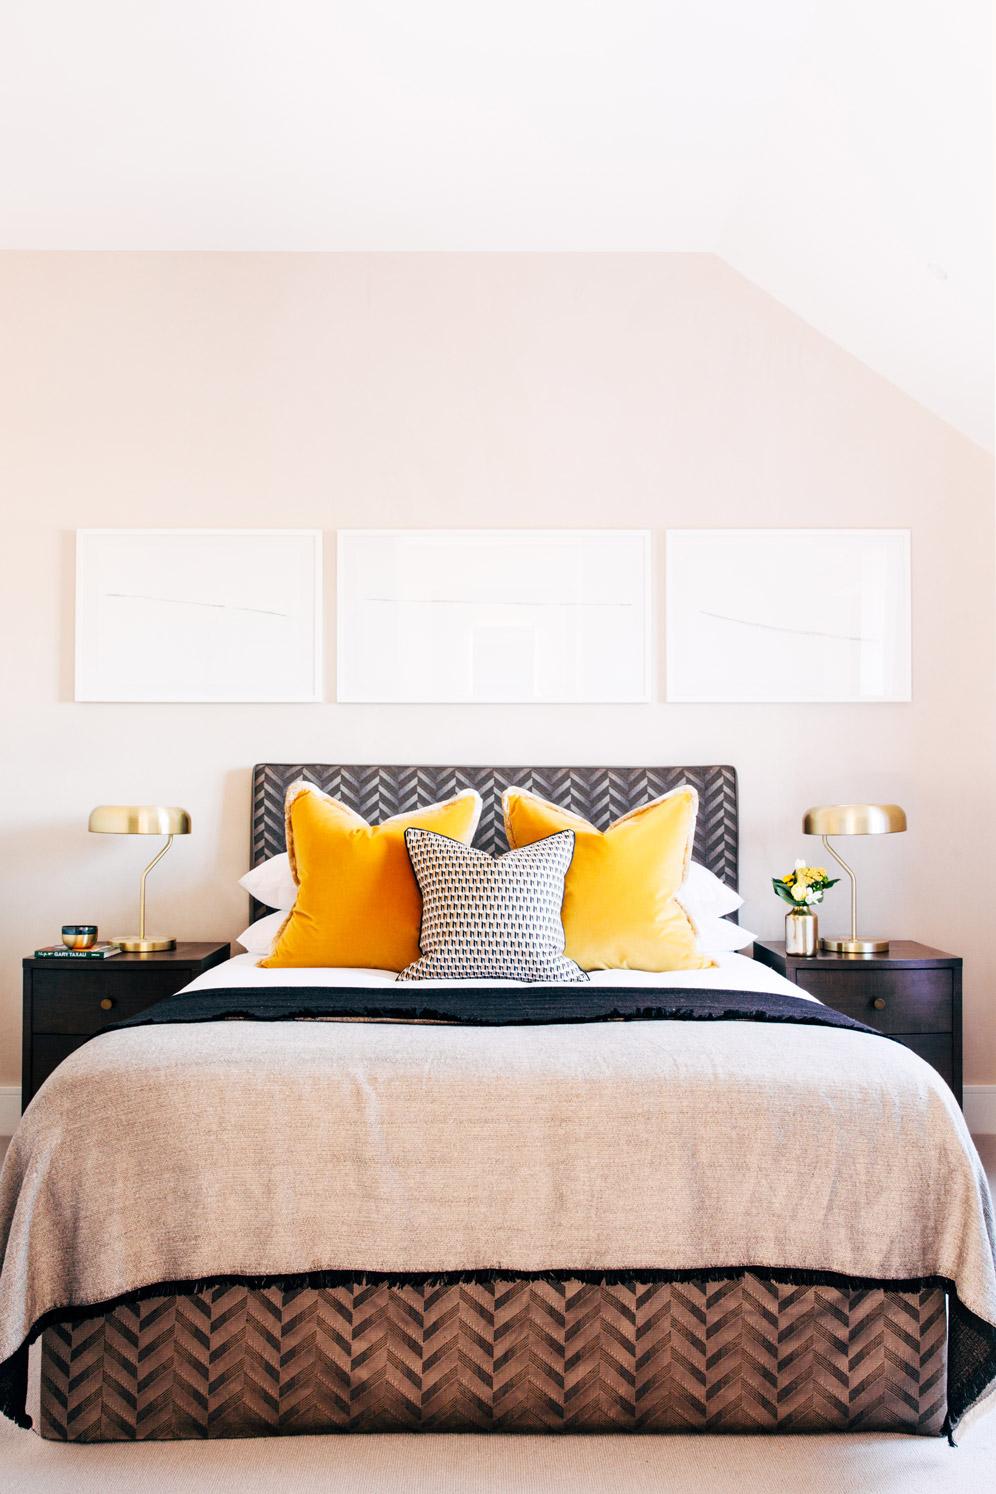 A_LONDON_Hamilton_Court_2_06_Bedroom.jpg